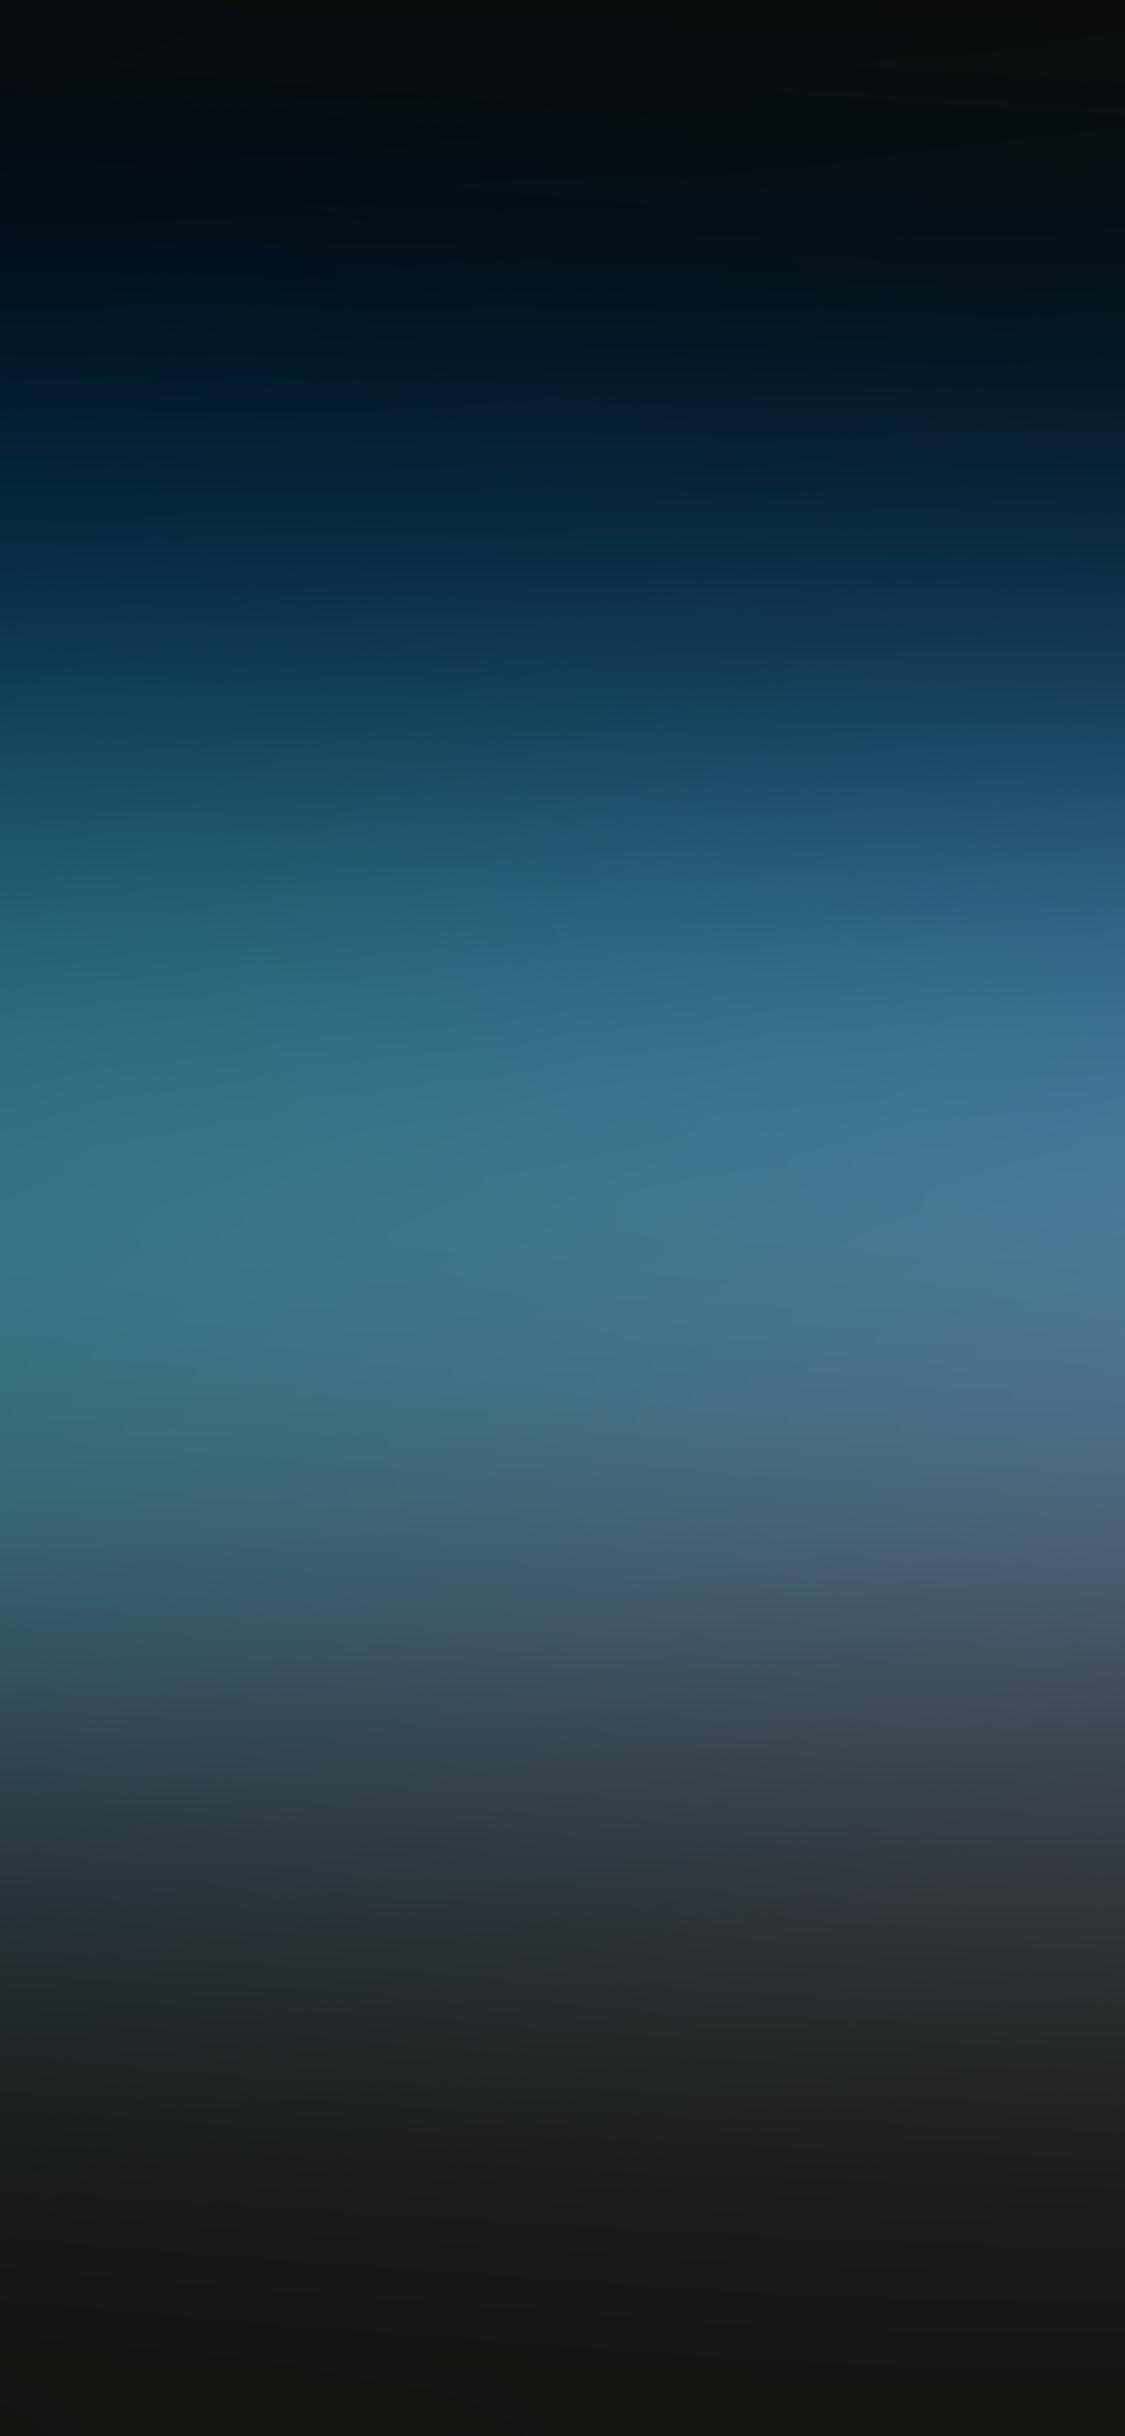 papers.co sj25 blue soft pastel gradation blur 41 iphone wallpaper